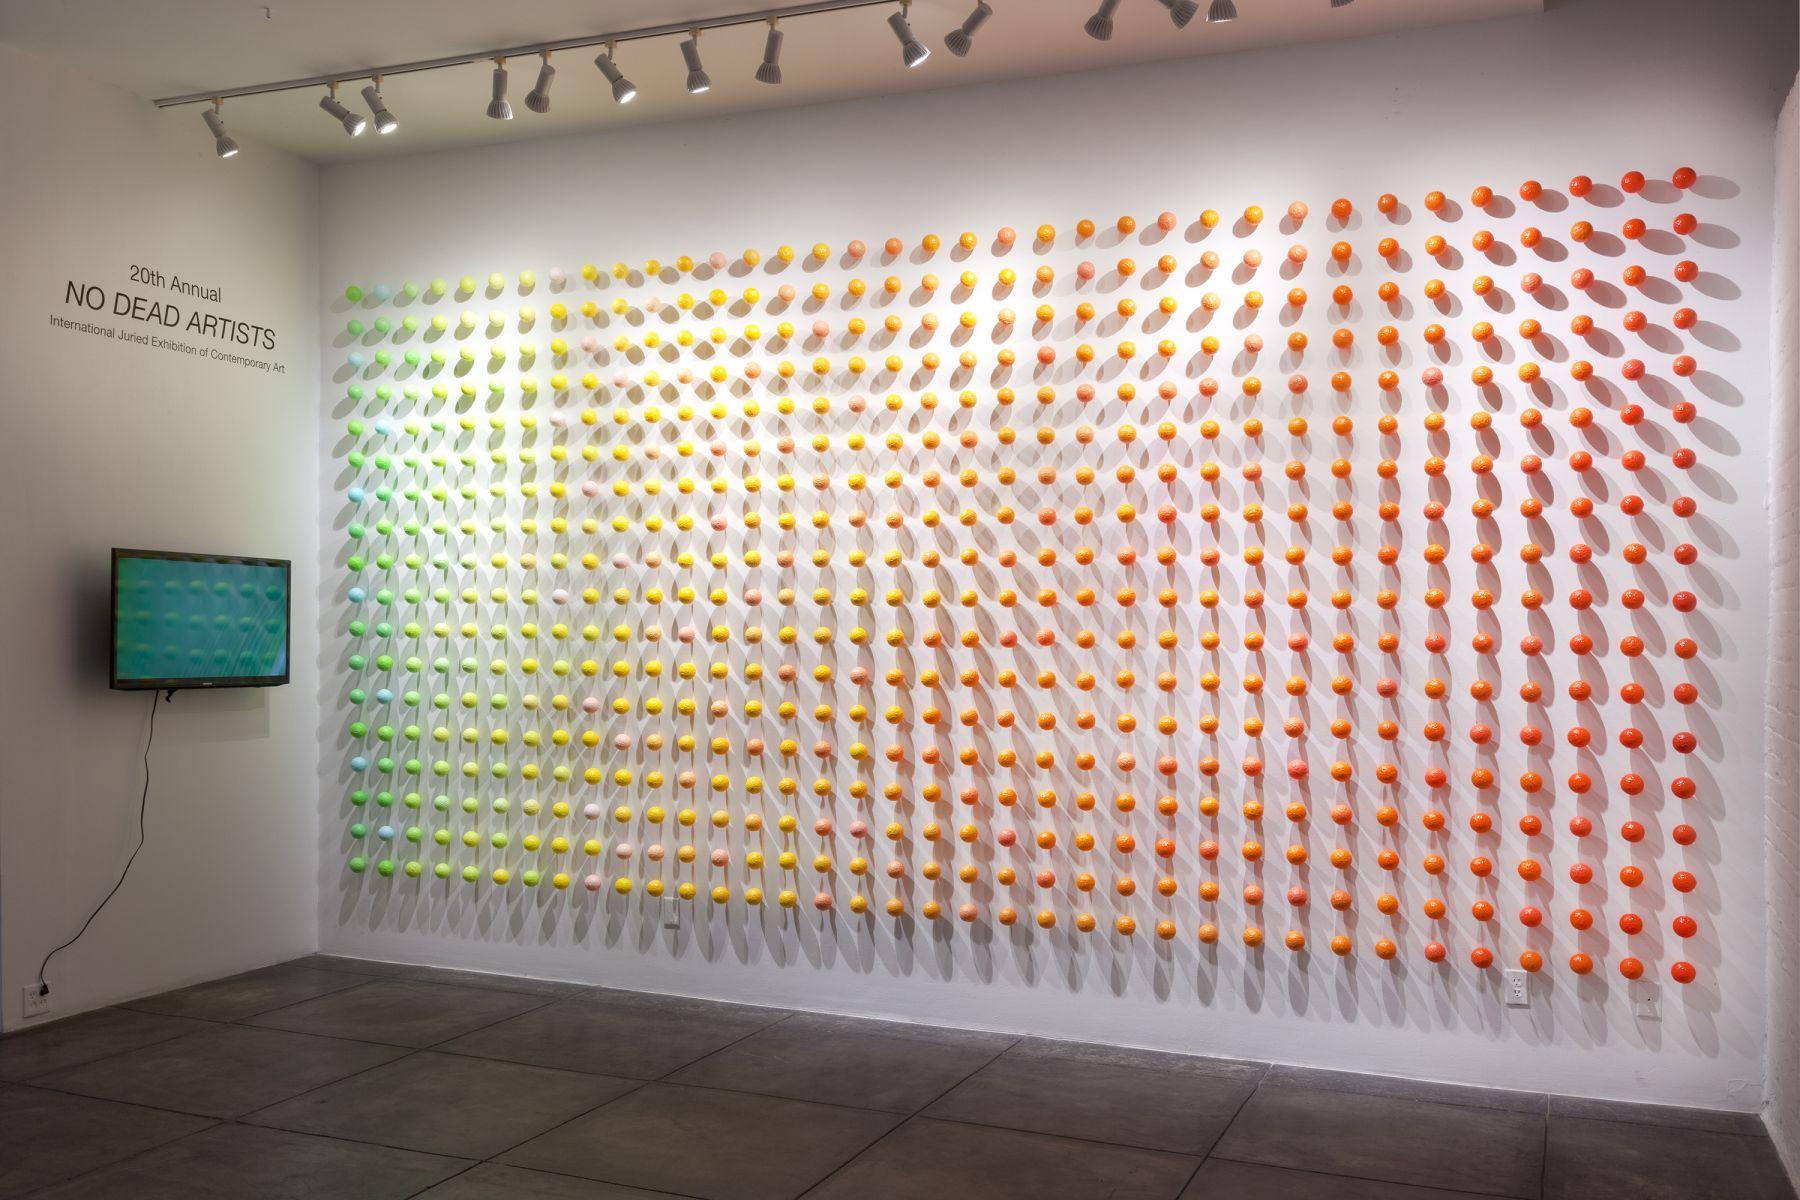 20th AnnualNO DEAD ARTISTSInternational Juried Exhibition of Contemporary Art